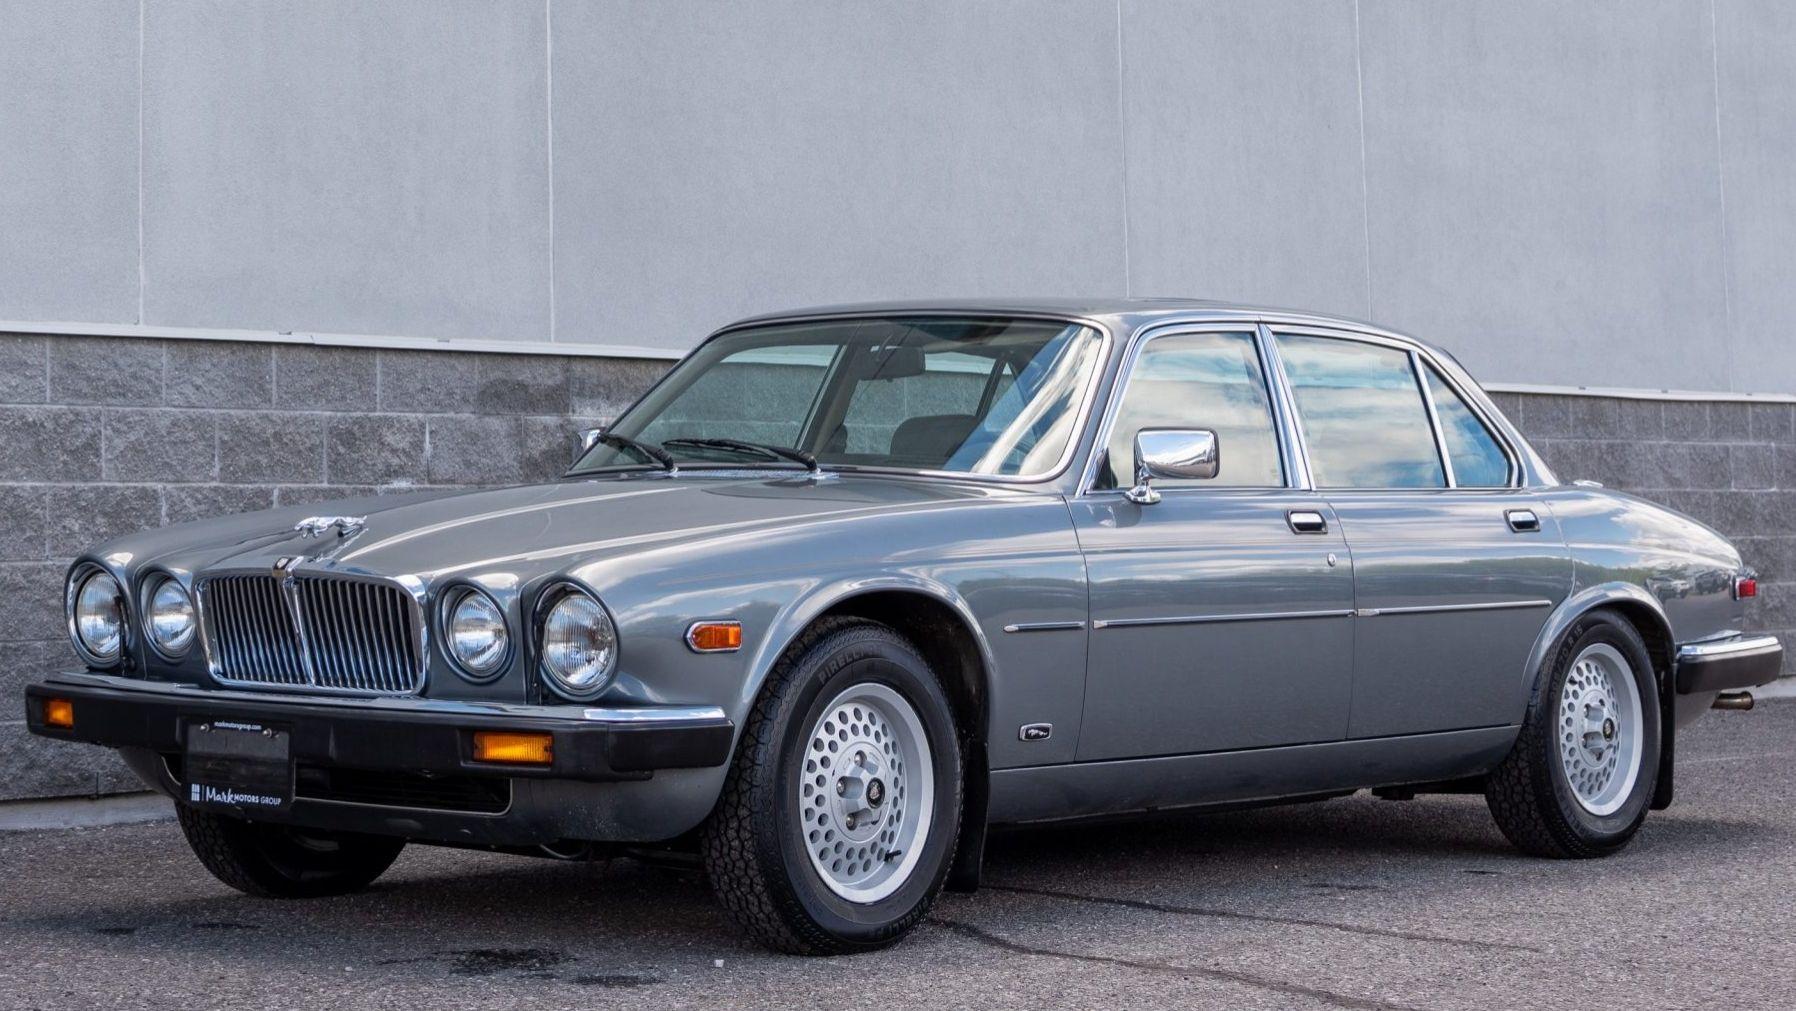 1987 Jaguar XJ6 Sovereign VIN: SAJCL1247HC468474 - CLASSIC.COM